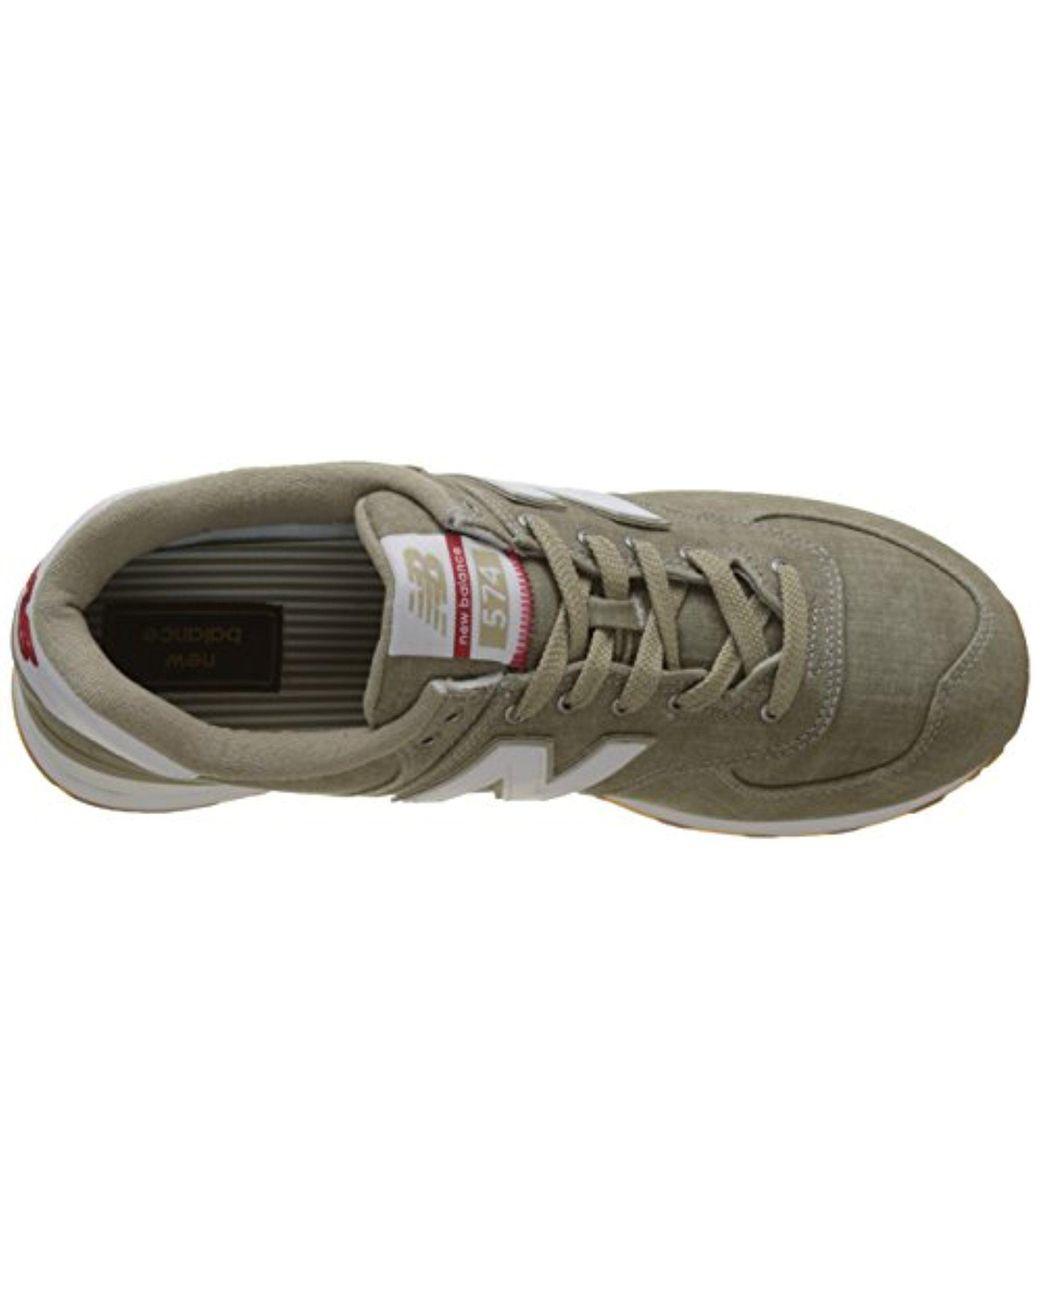 sports shoes aac04 67b4f Women's Natural Ml574ylc